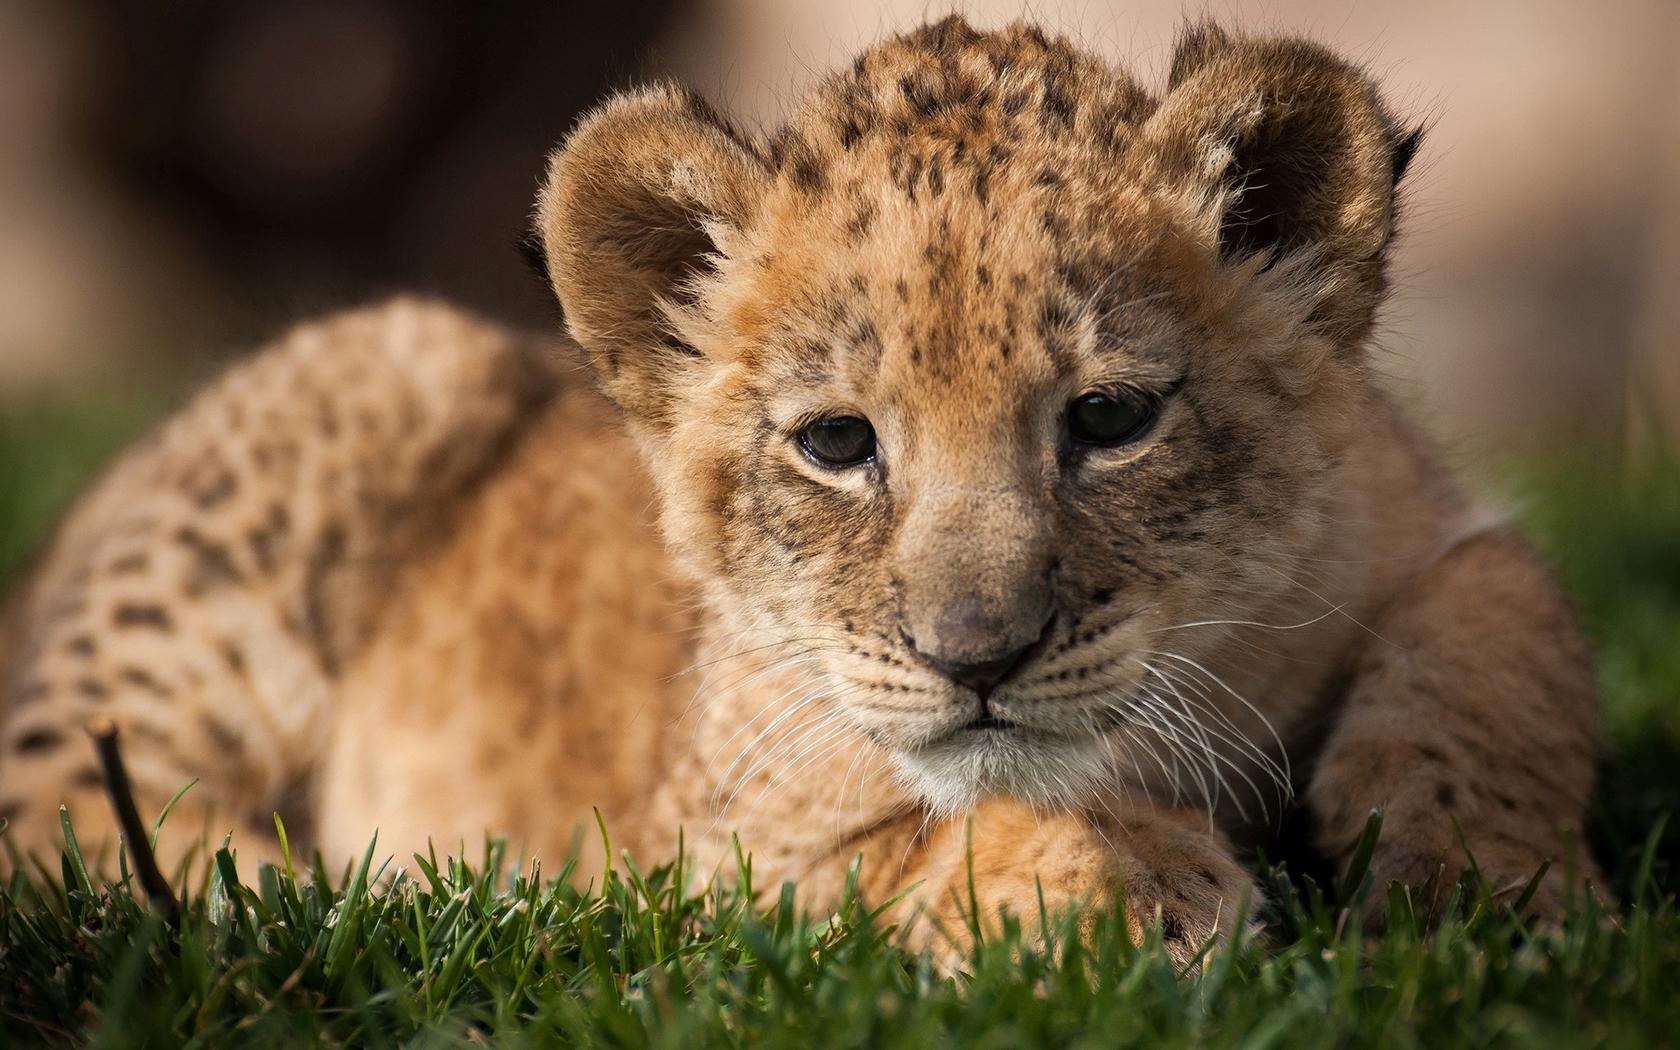 Lion cub Widescreen Wallpaper   10069 1680x1050